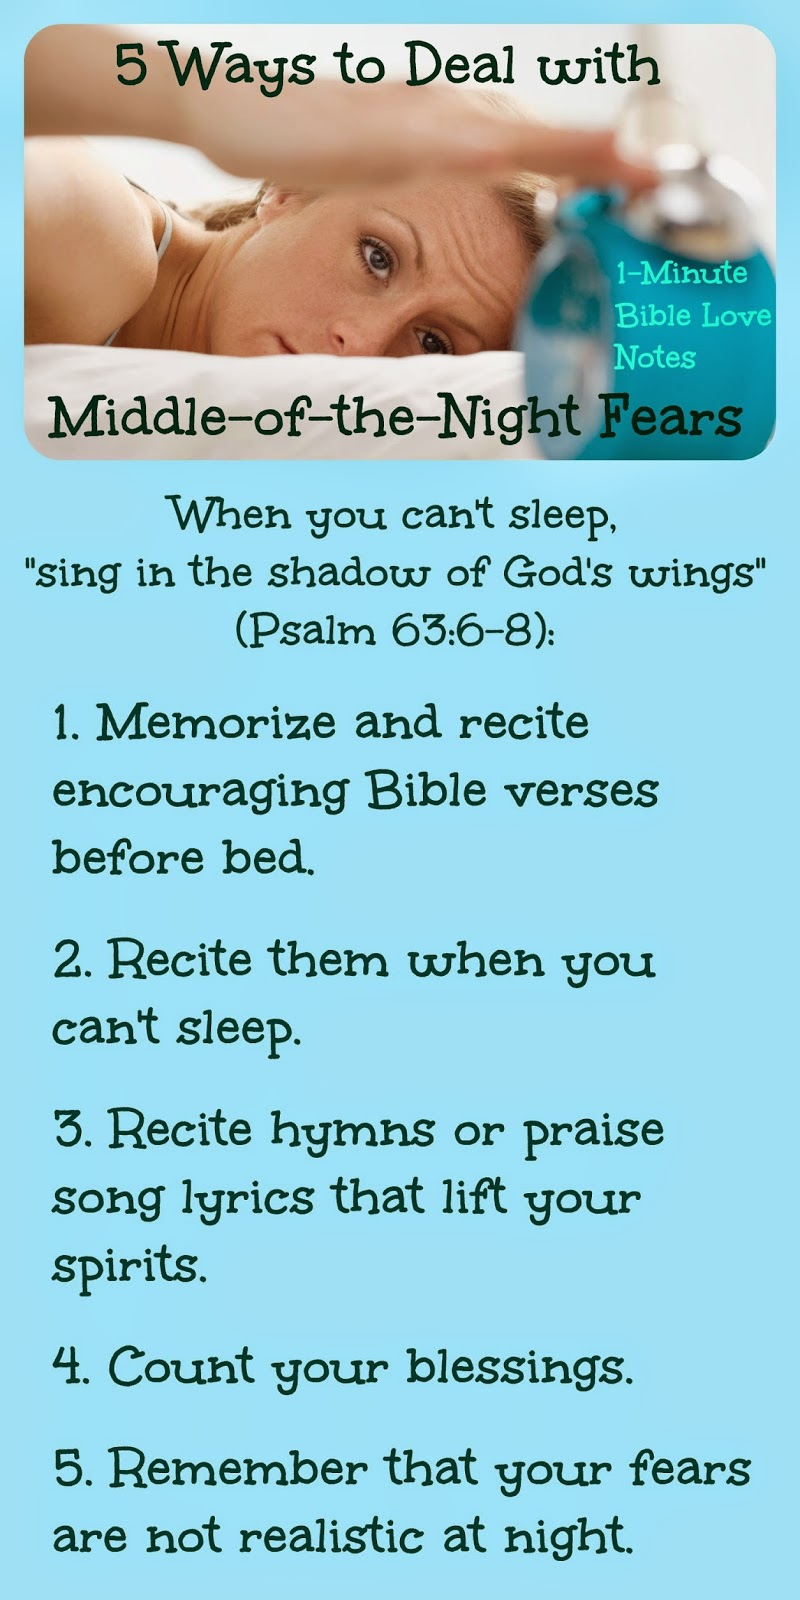 night terrors, night worries, peace in God, Psalms